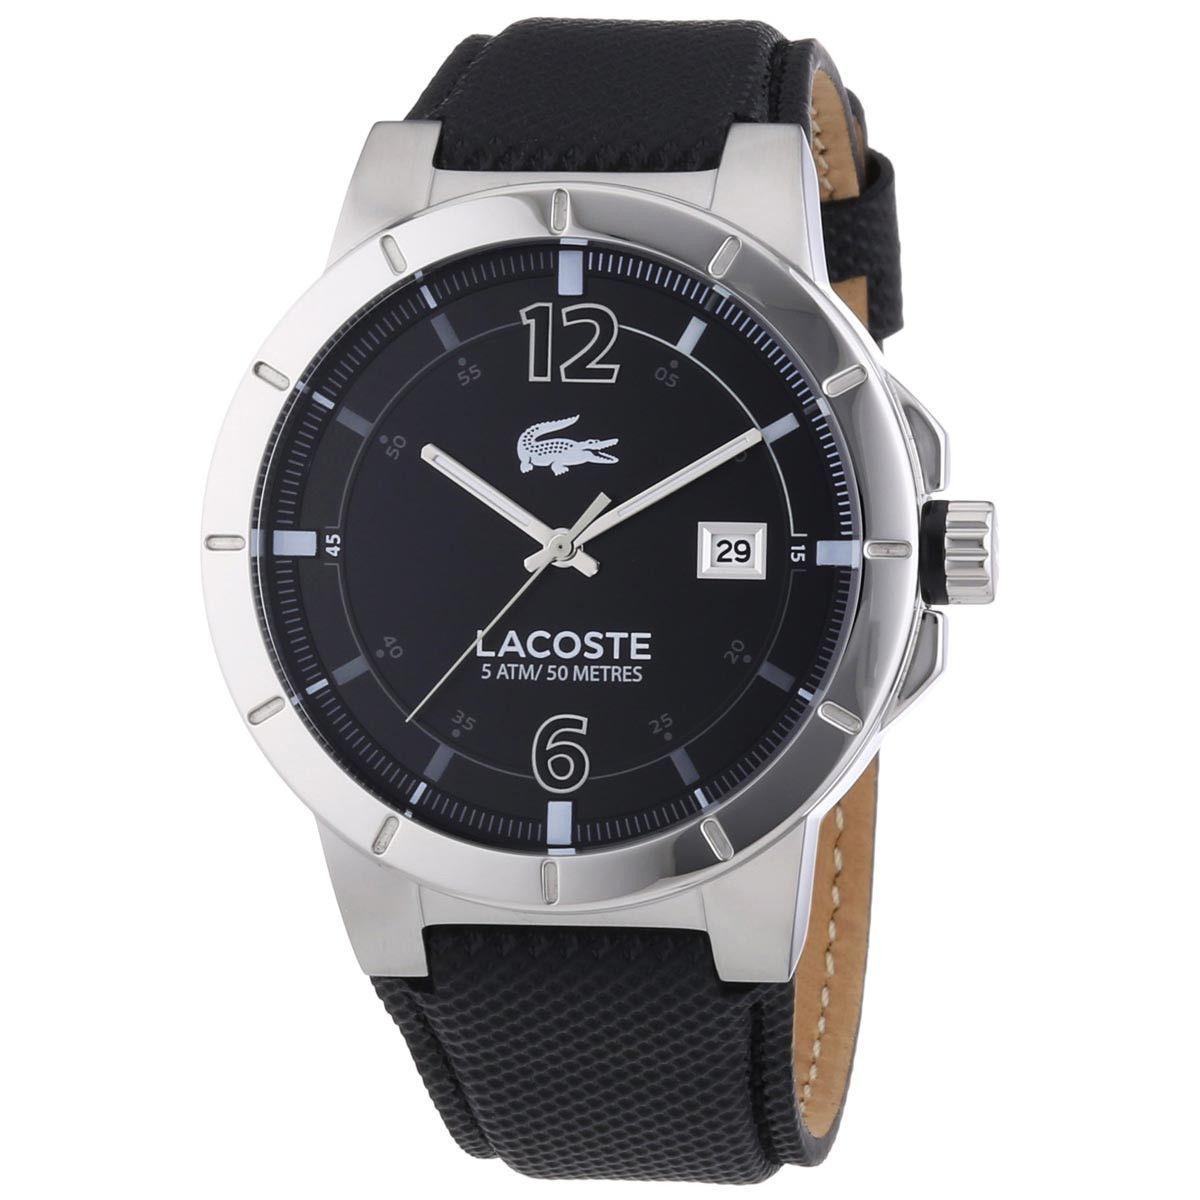 2010727 Darwin Men's Dial Leather Black Lacoste Strap Watch 67gyYbf